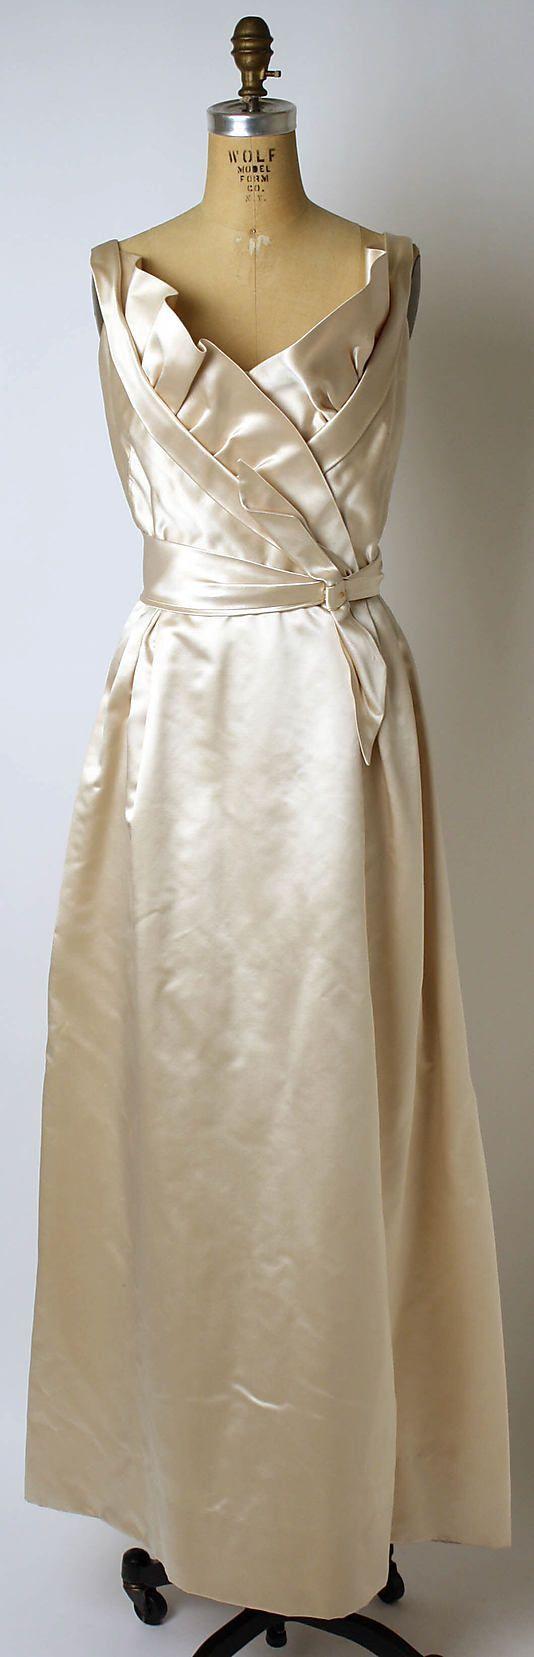 1940 wedding dress  Christian Dior dress c late us  s Fashion  Pinterest